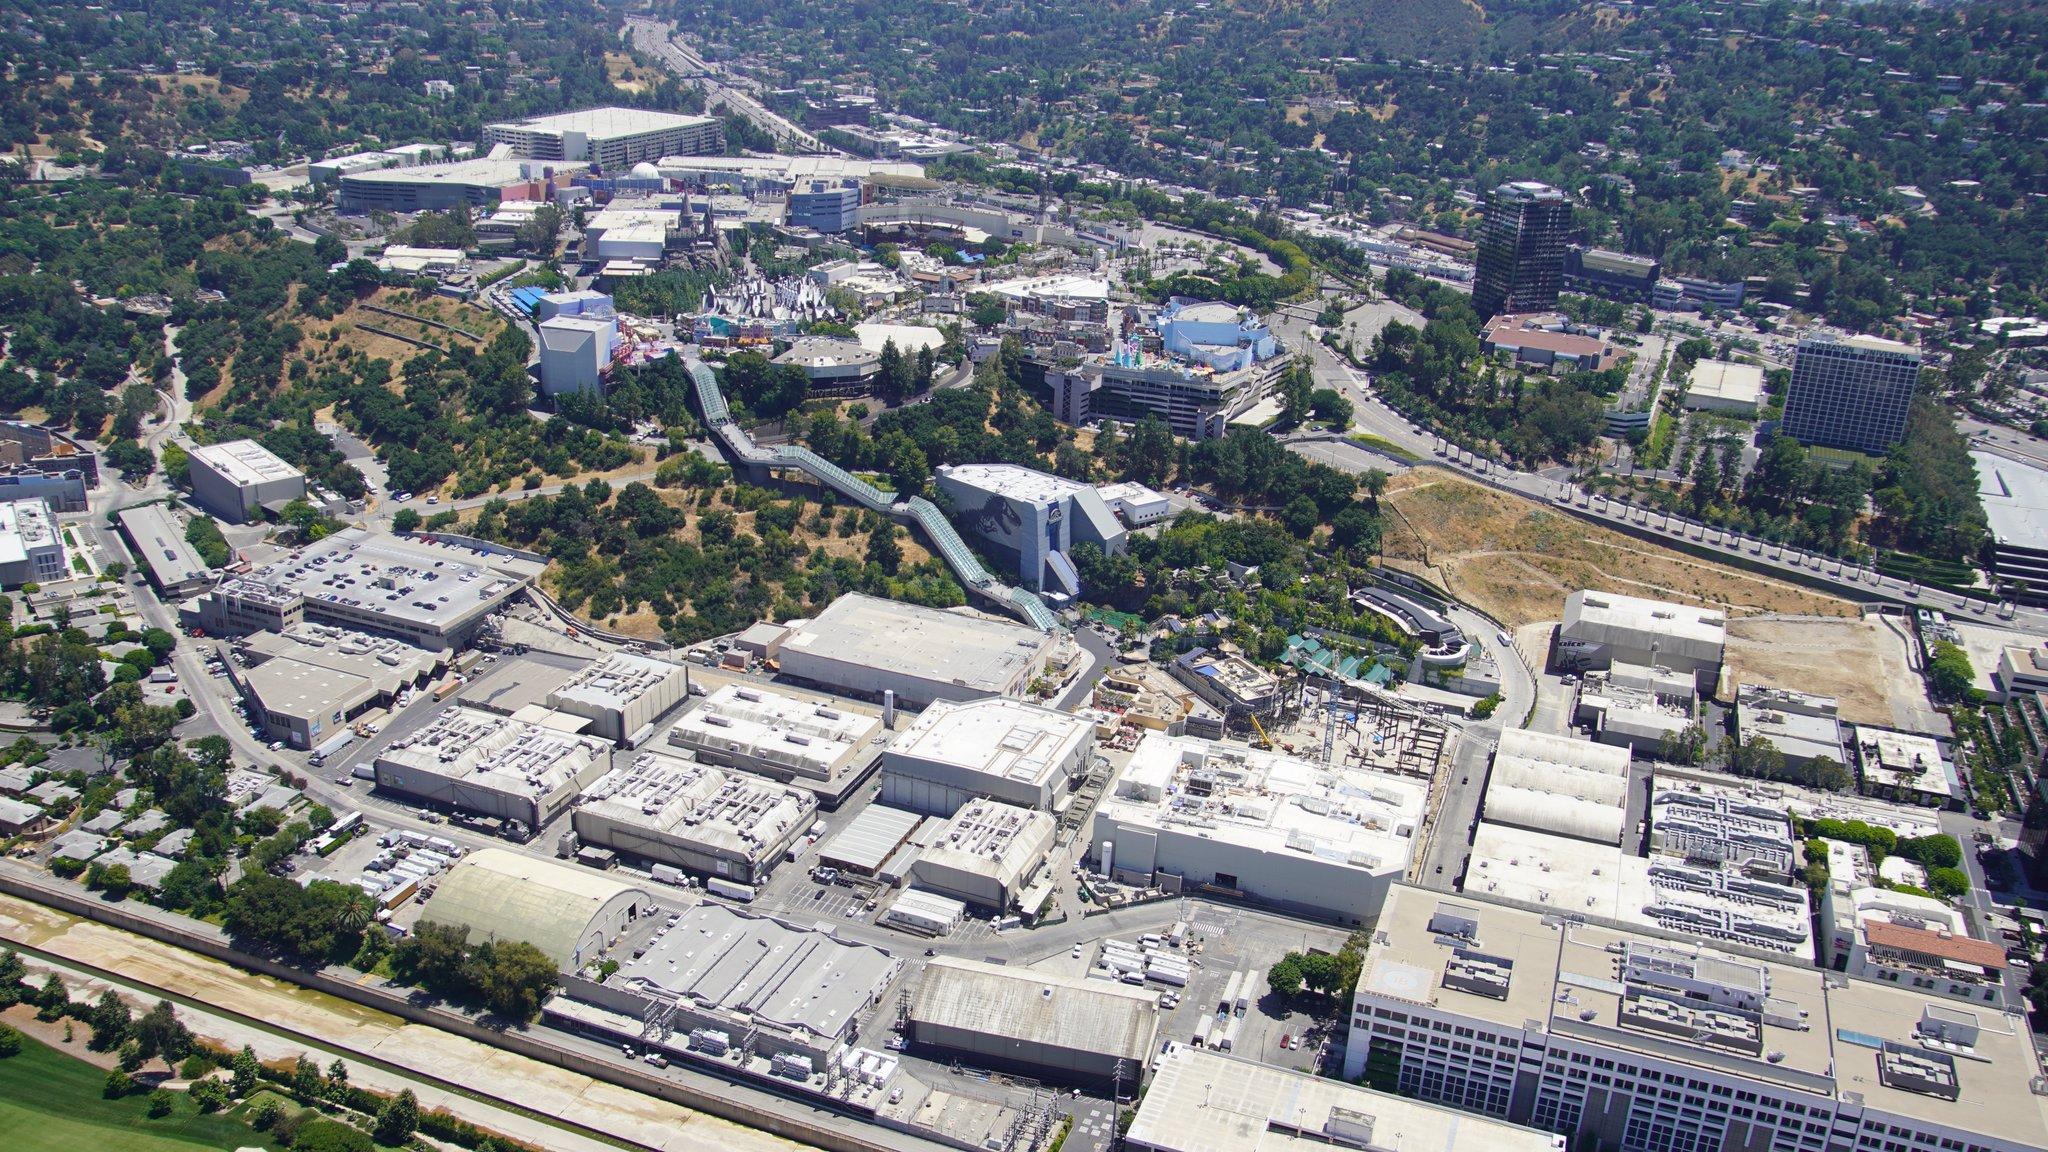 Universal Studios Hollywood [USA - 1964] - Page 21 EcrgmoTX0AI5Q0u?format=jpg&name=large